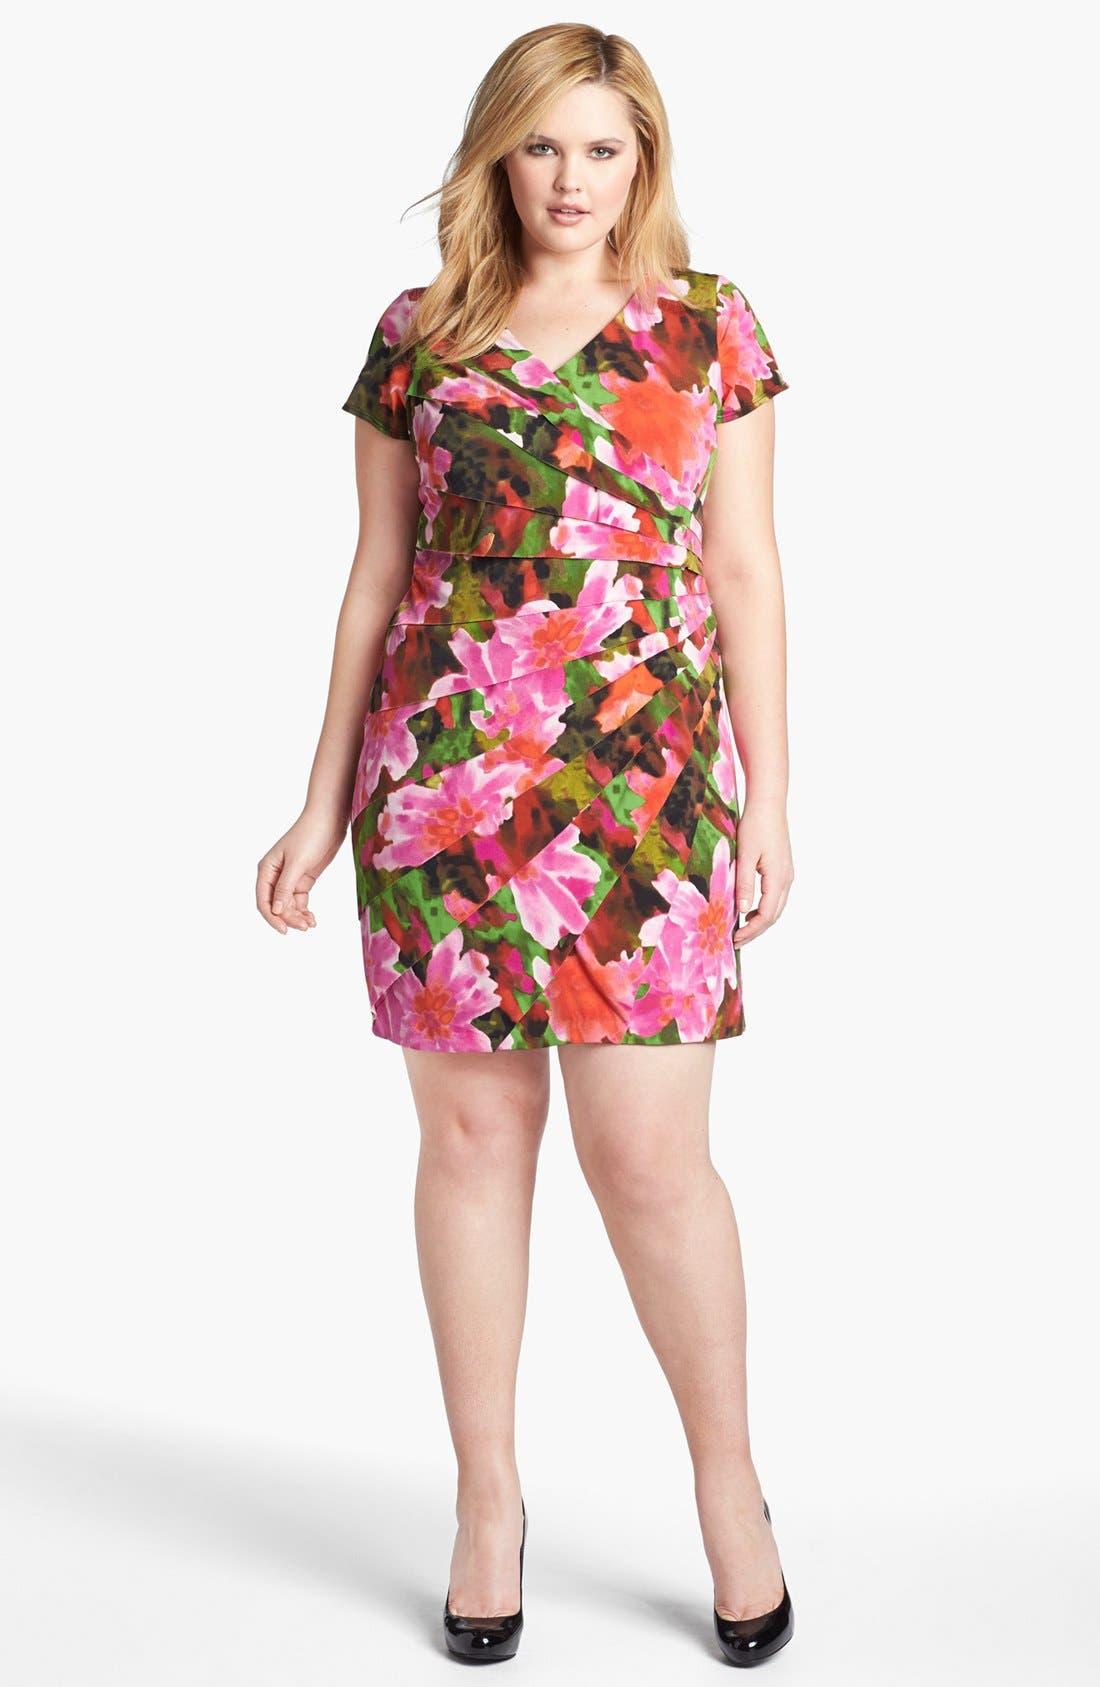 Alternate Image 1 Selected - London Times 'Starburst' Print Sheath Dress (Plus Size)